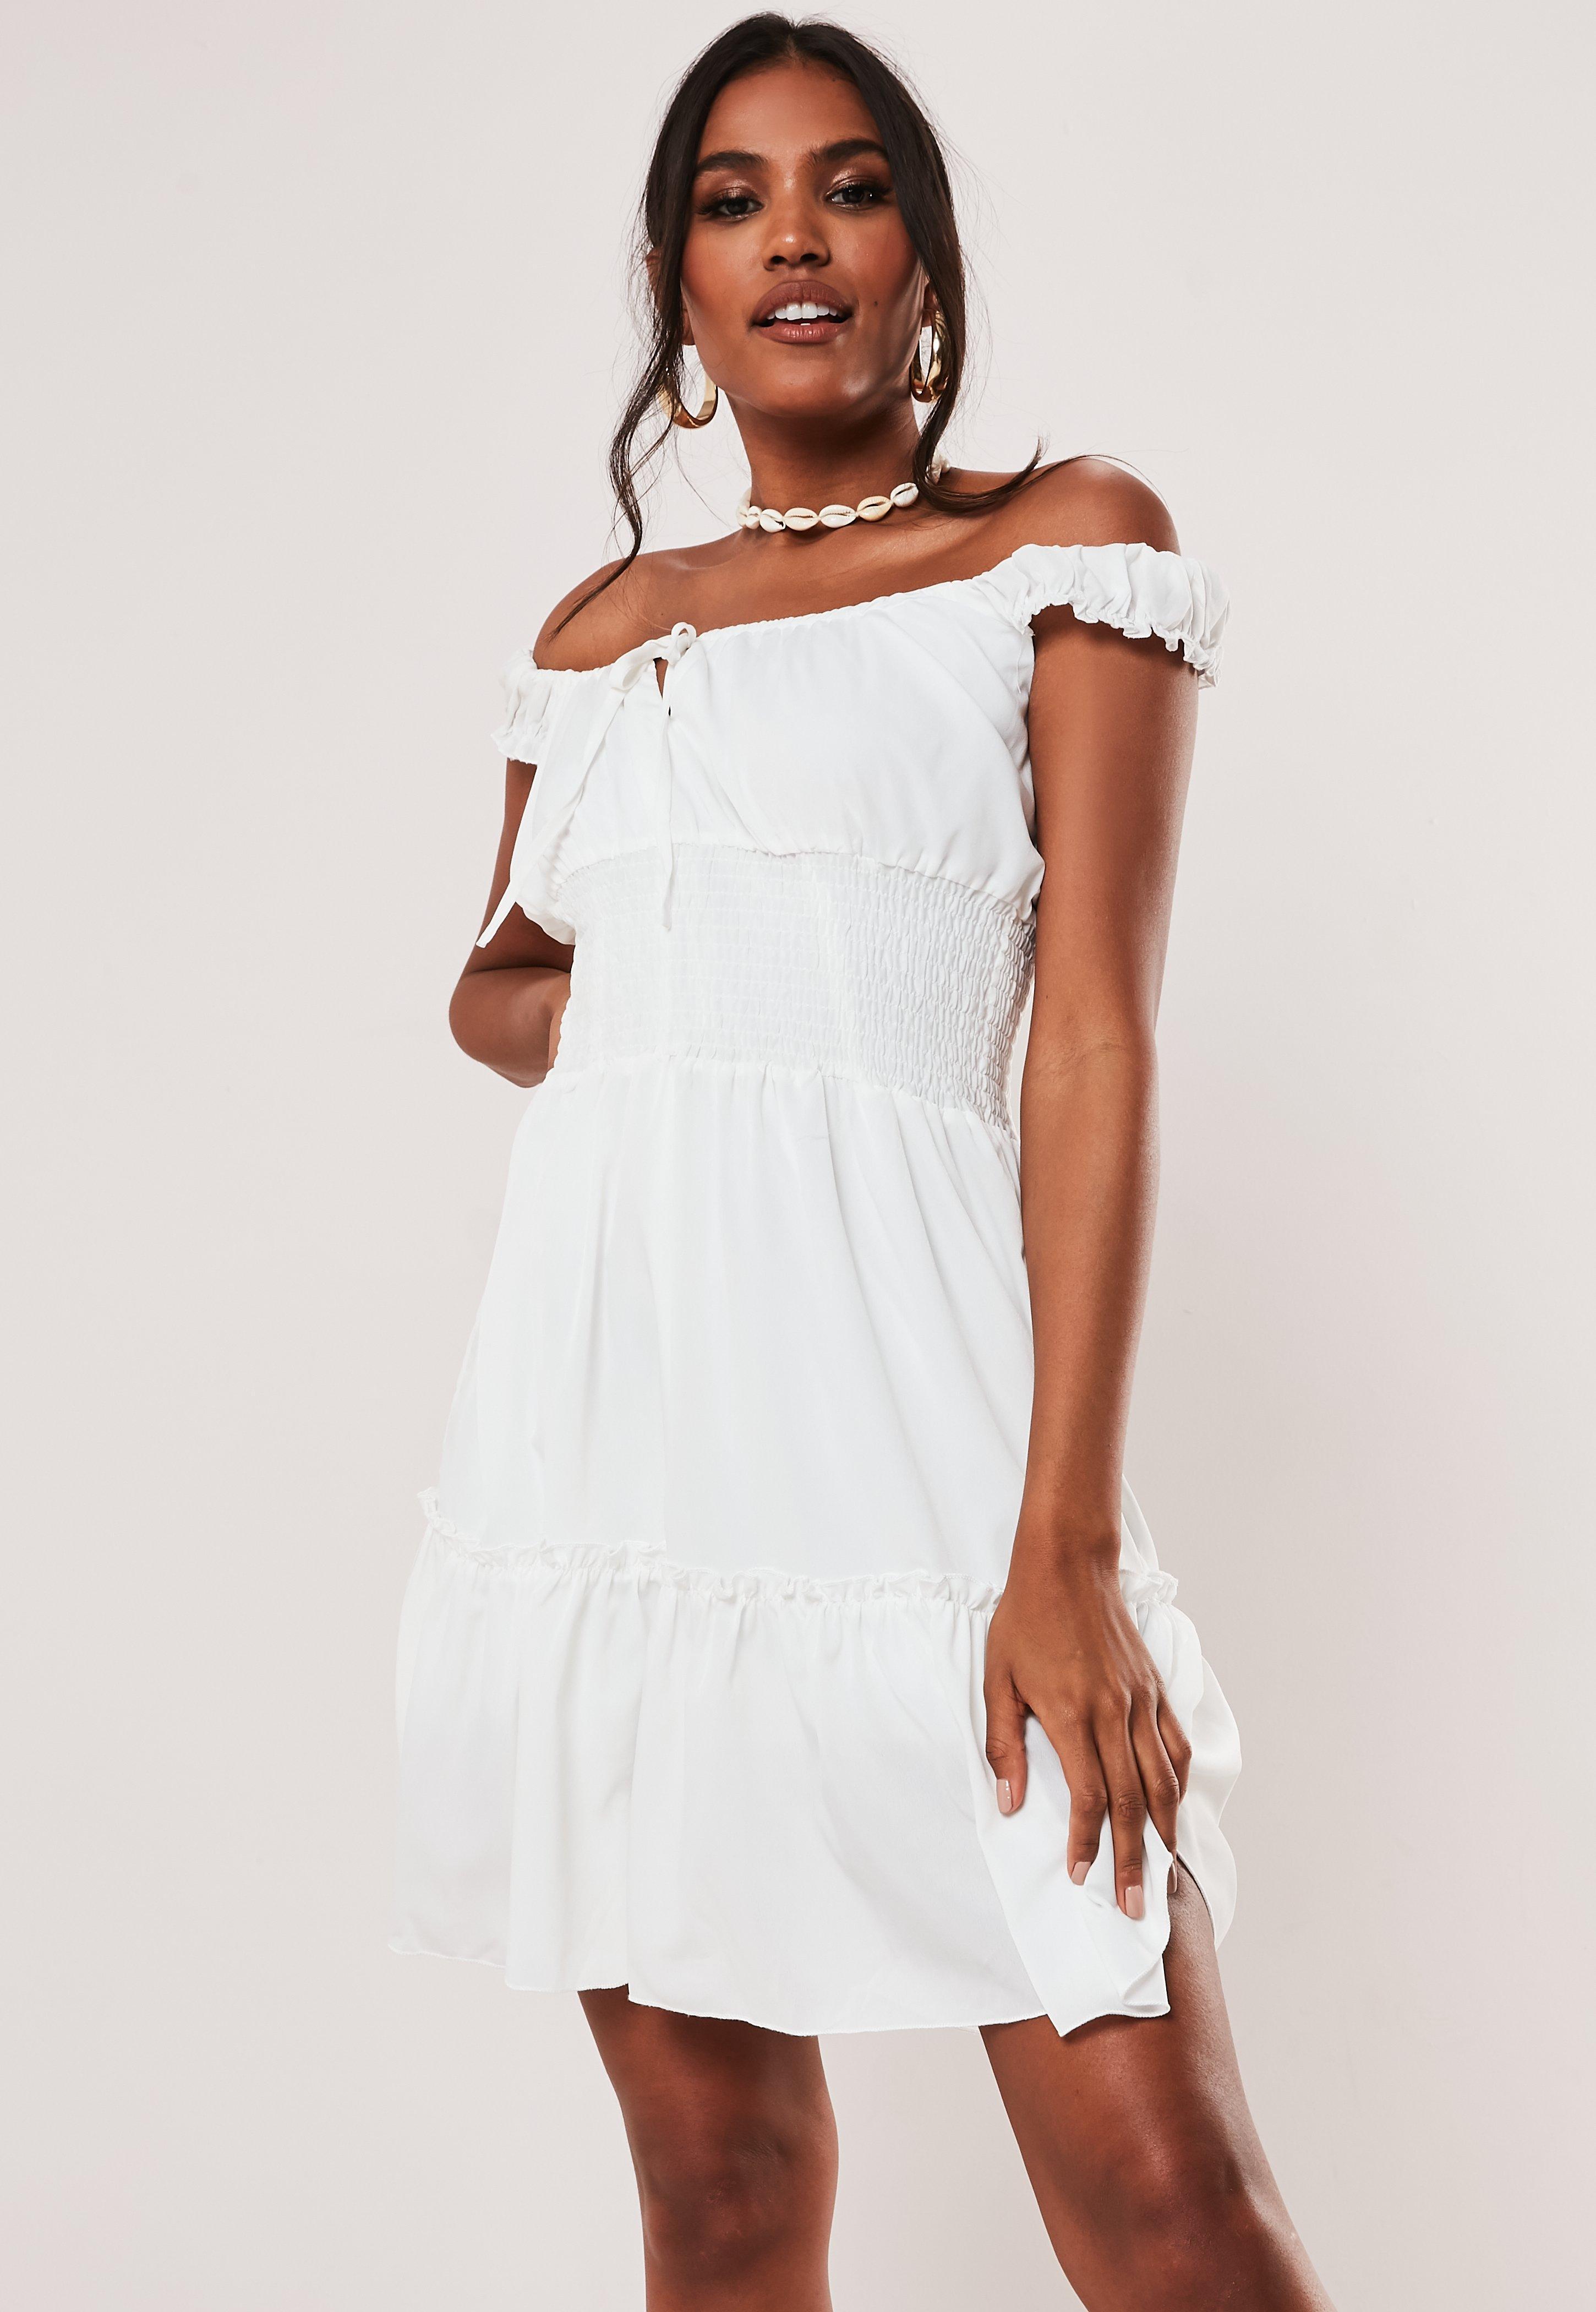 3e6ec10a89e1 White Dresses | Women's White Dresses Online - Missguided